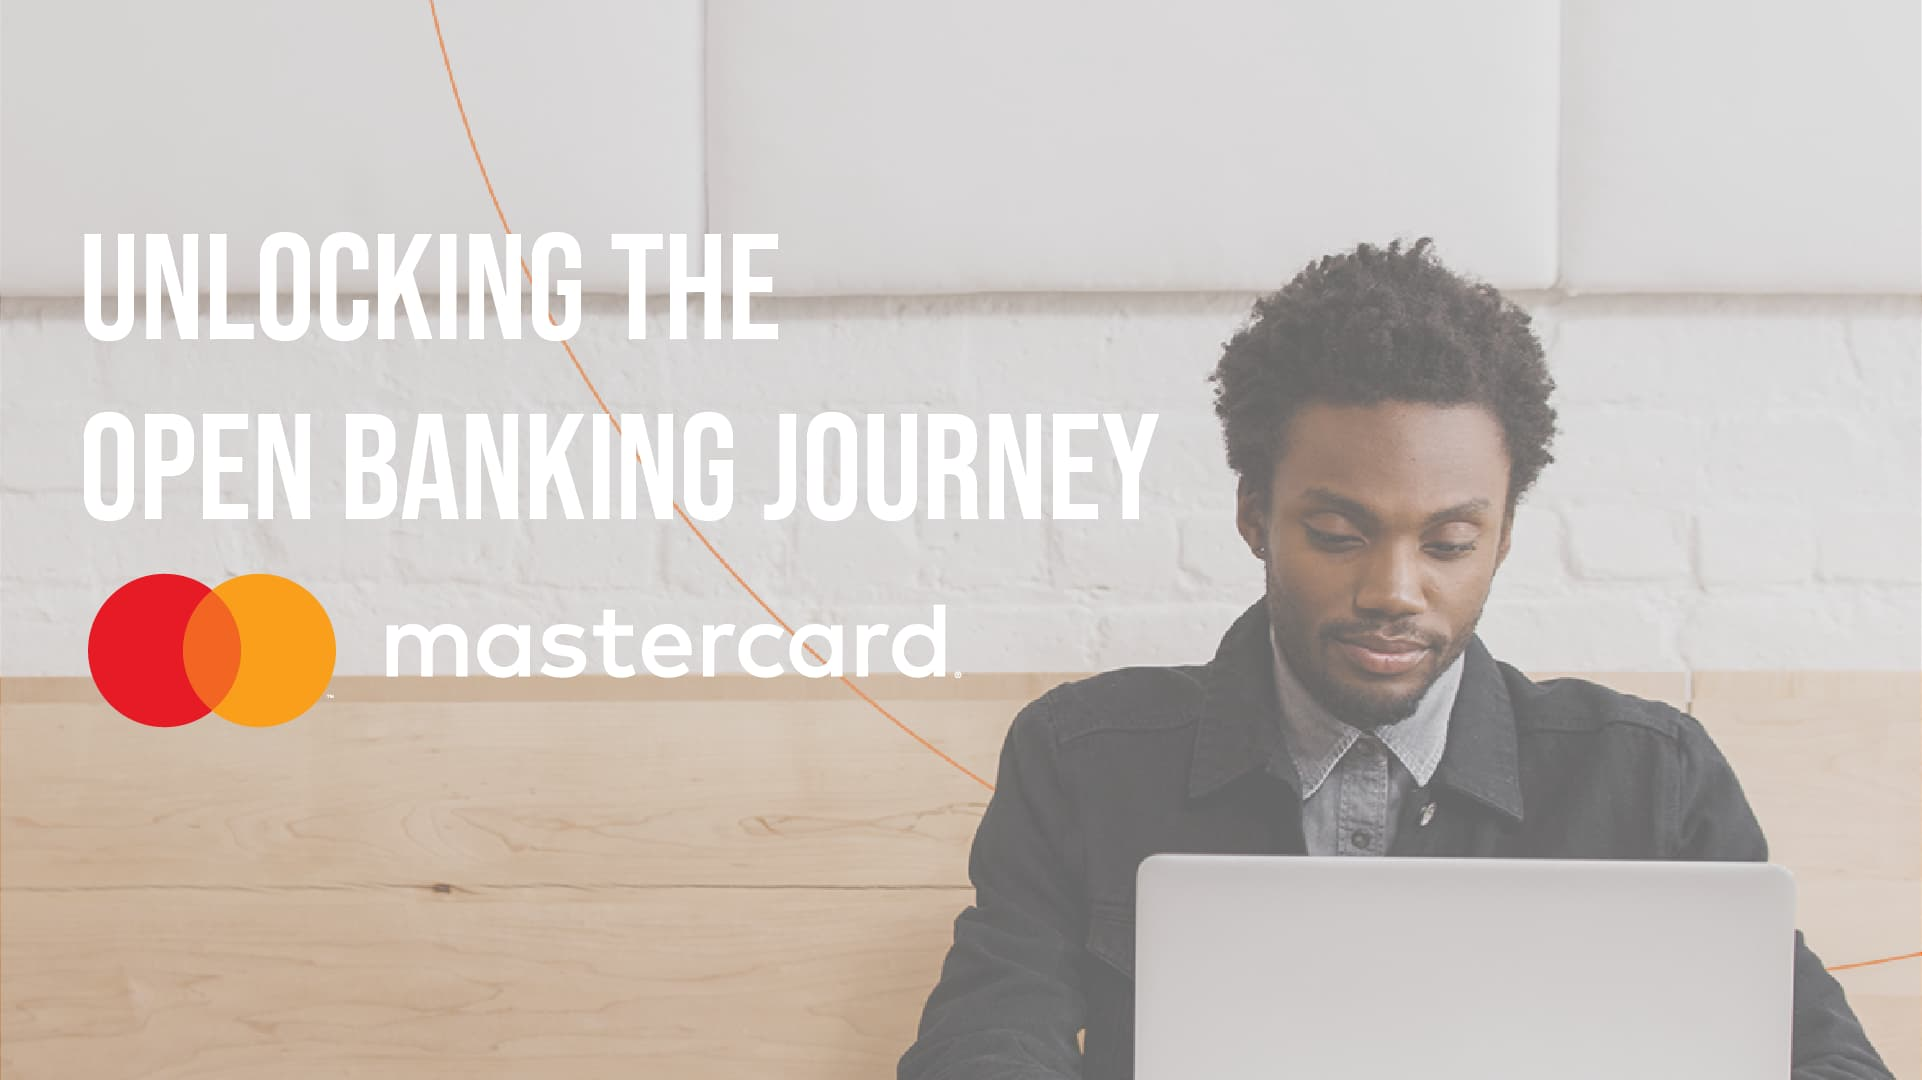 Mastercard: Unlocking the Open Banking Journey